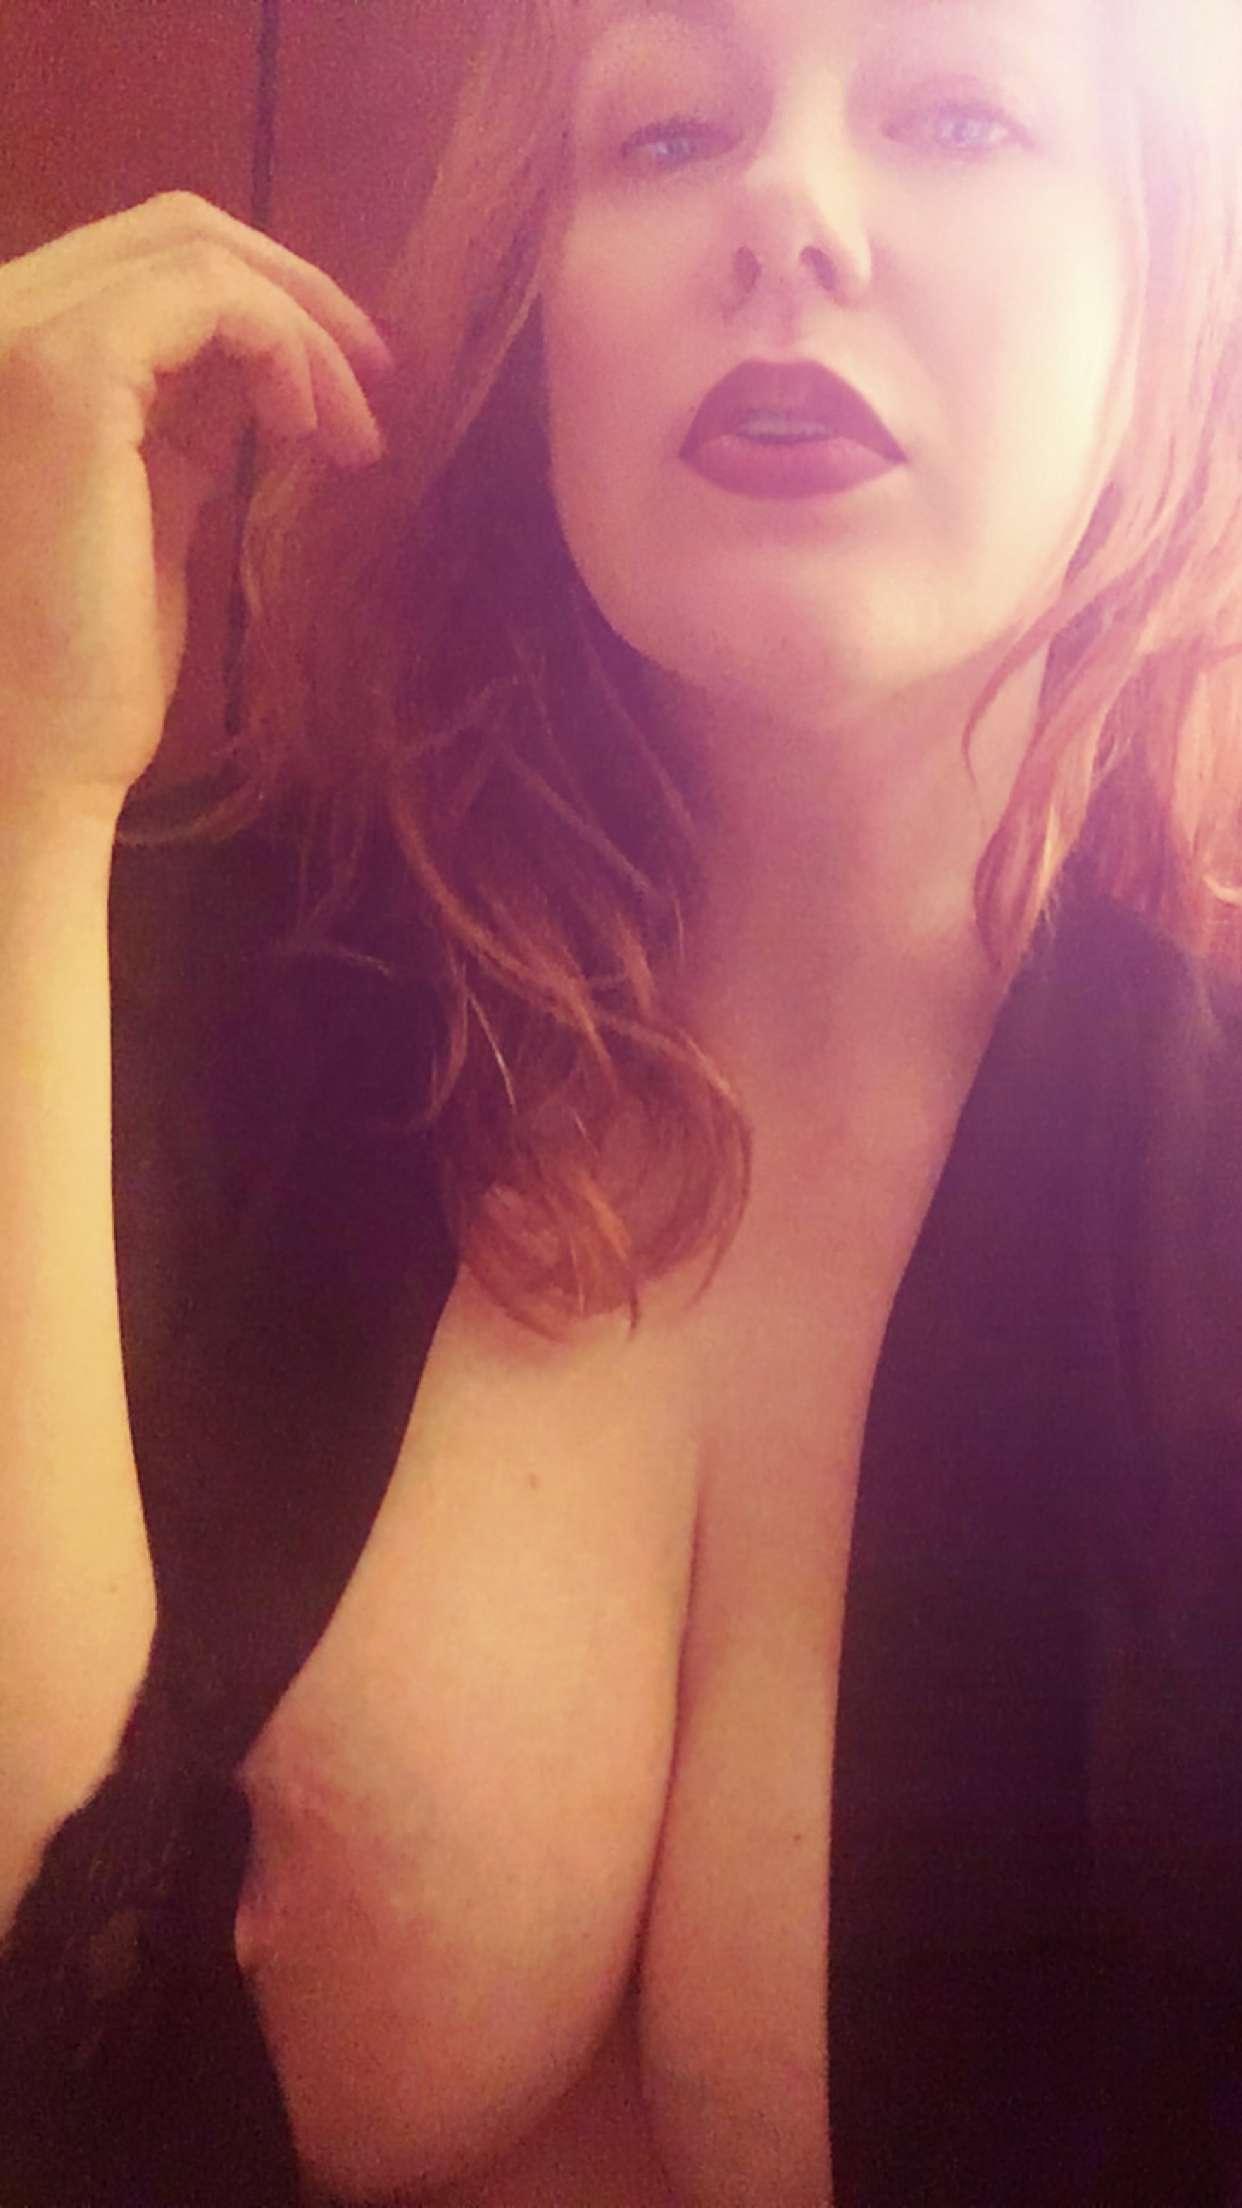 Black 18 Nude paula garces boob naked girls 18+ 2018 - xxx sex images.